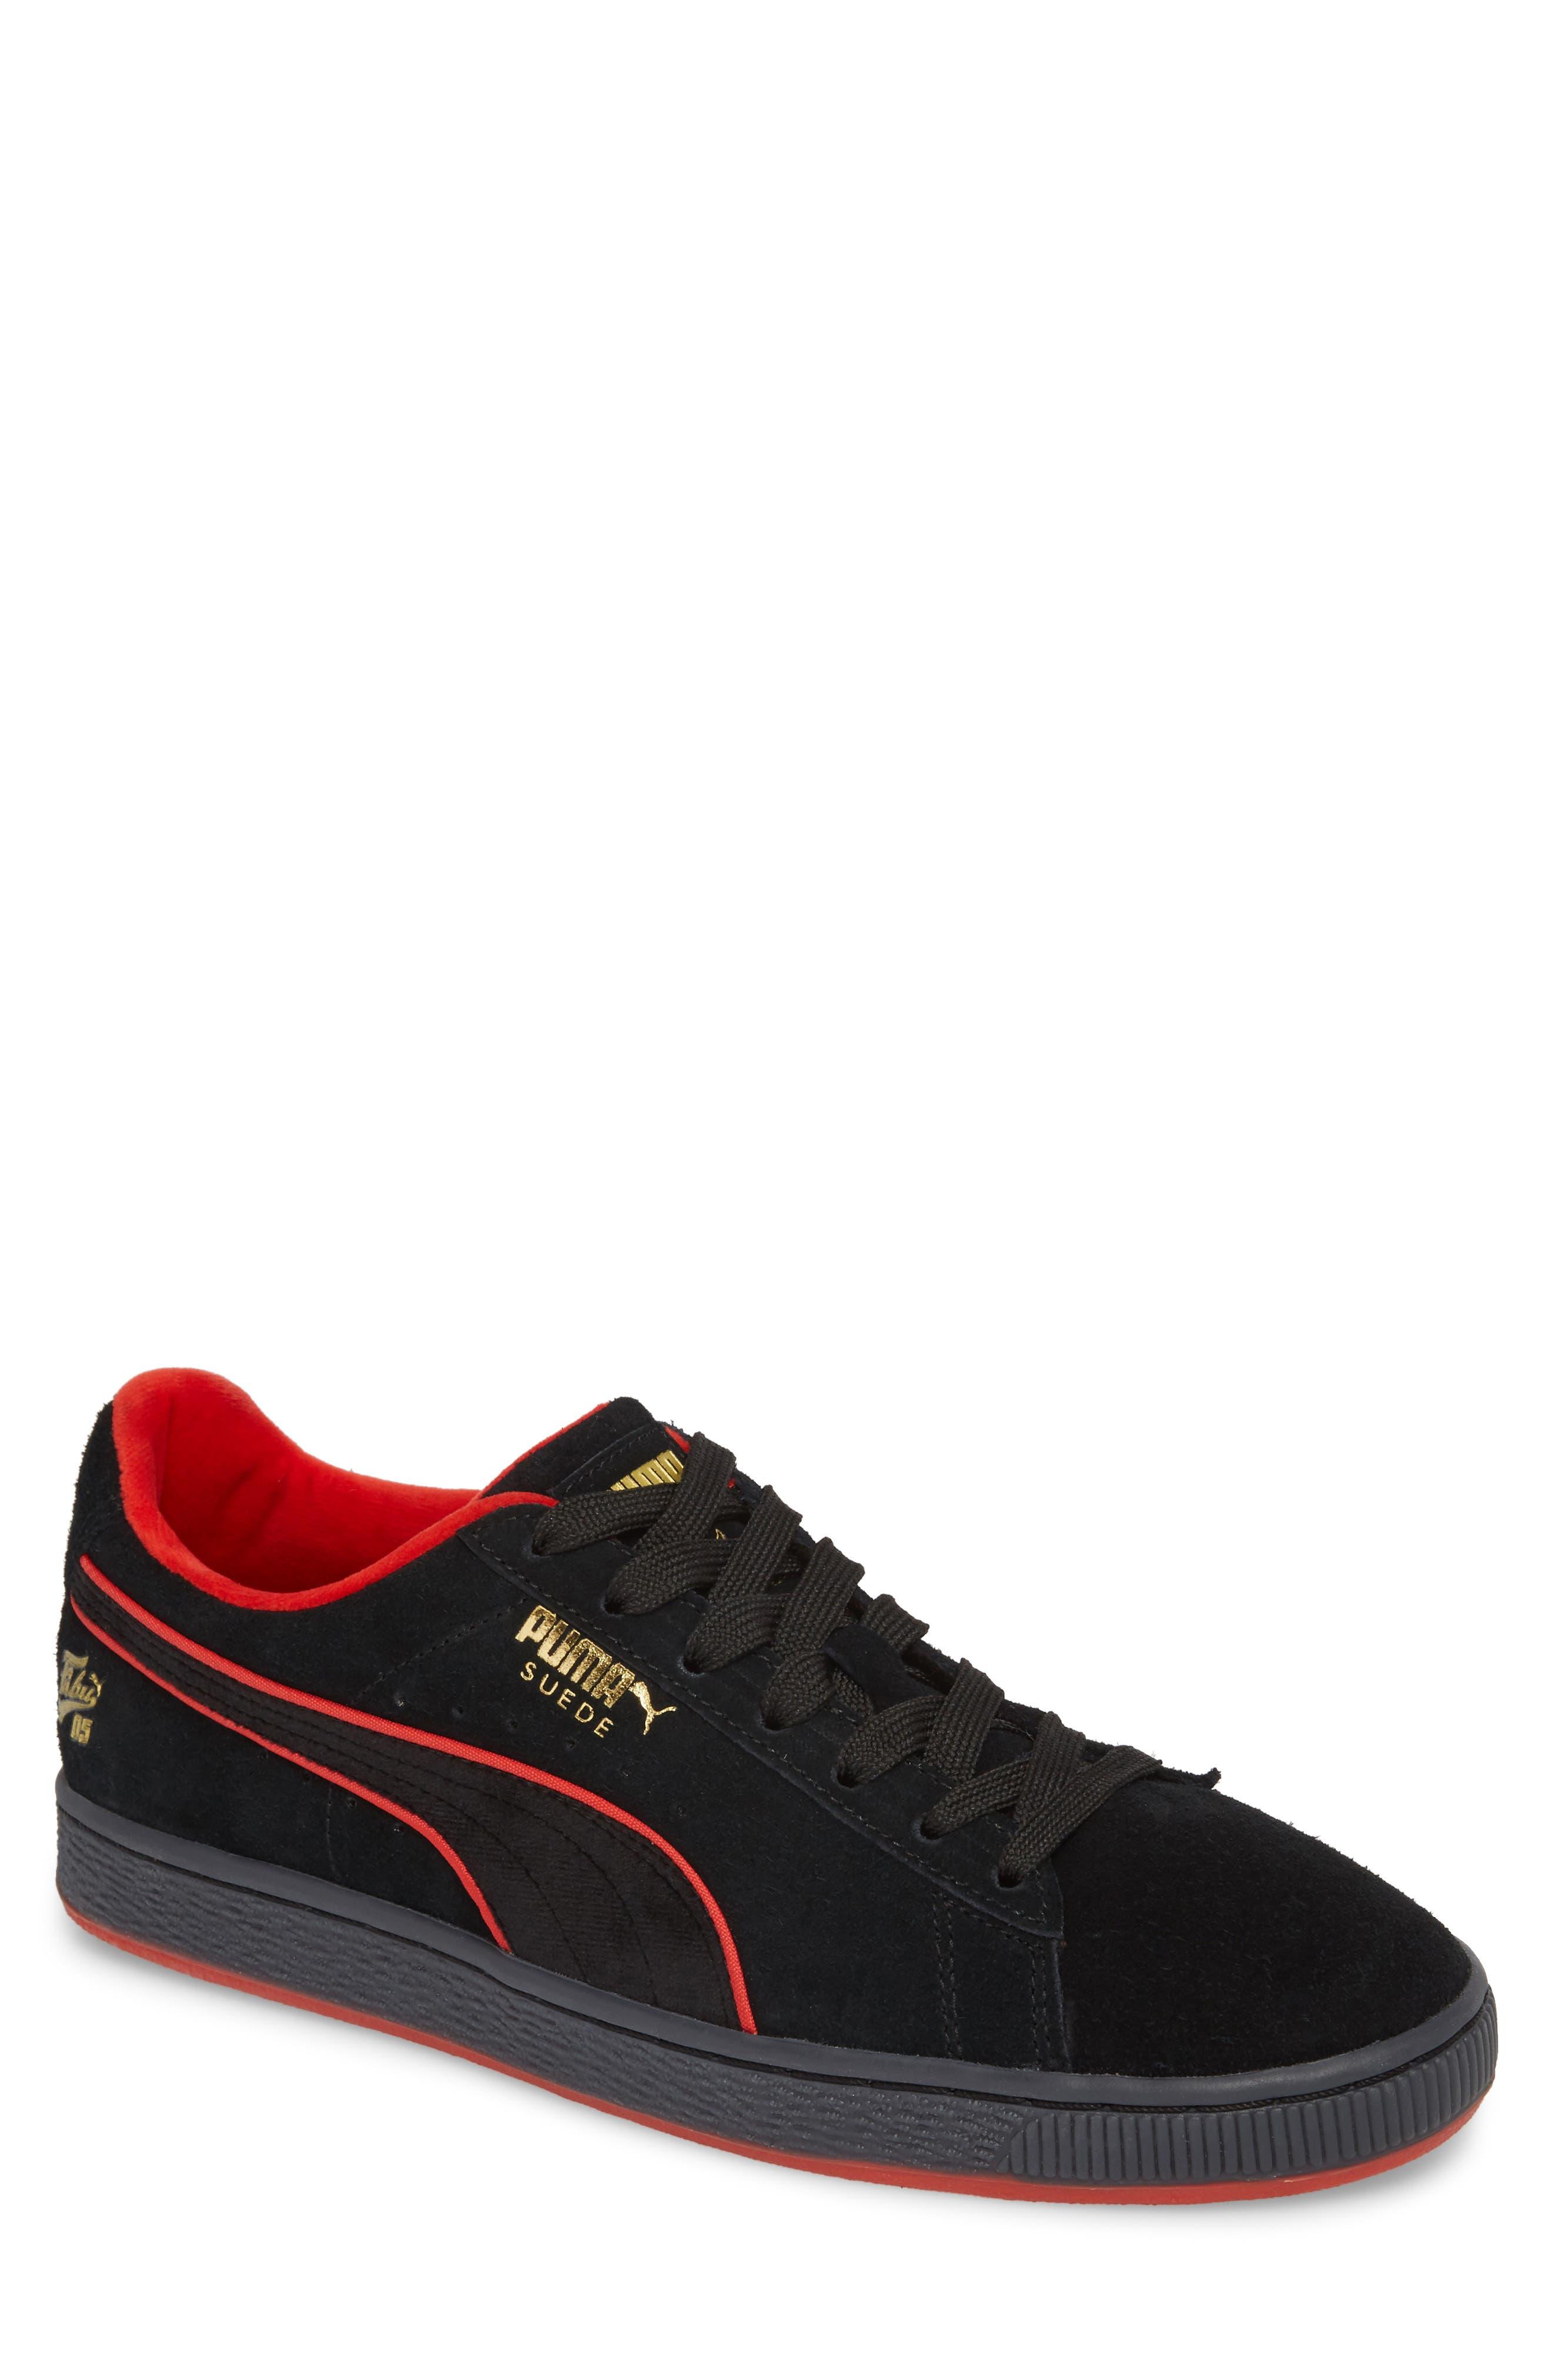 x FUBU Suede Classic Sneaker,                         Main,                         color, 001